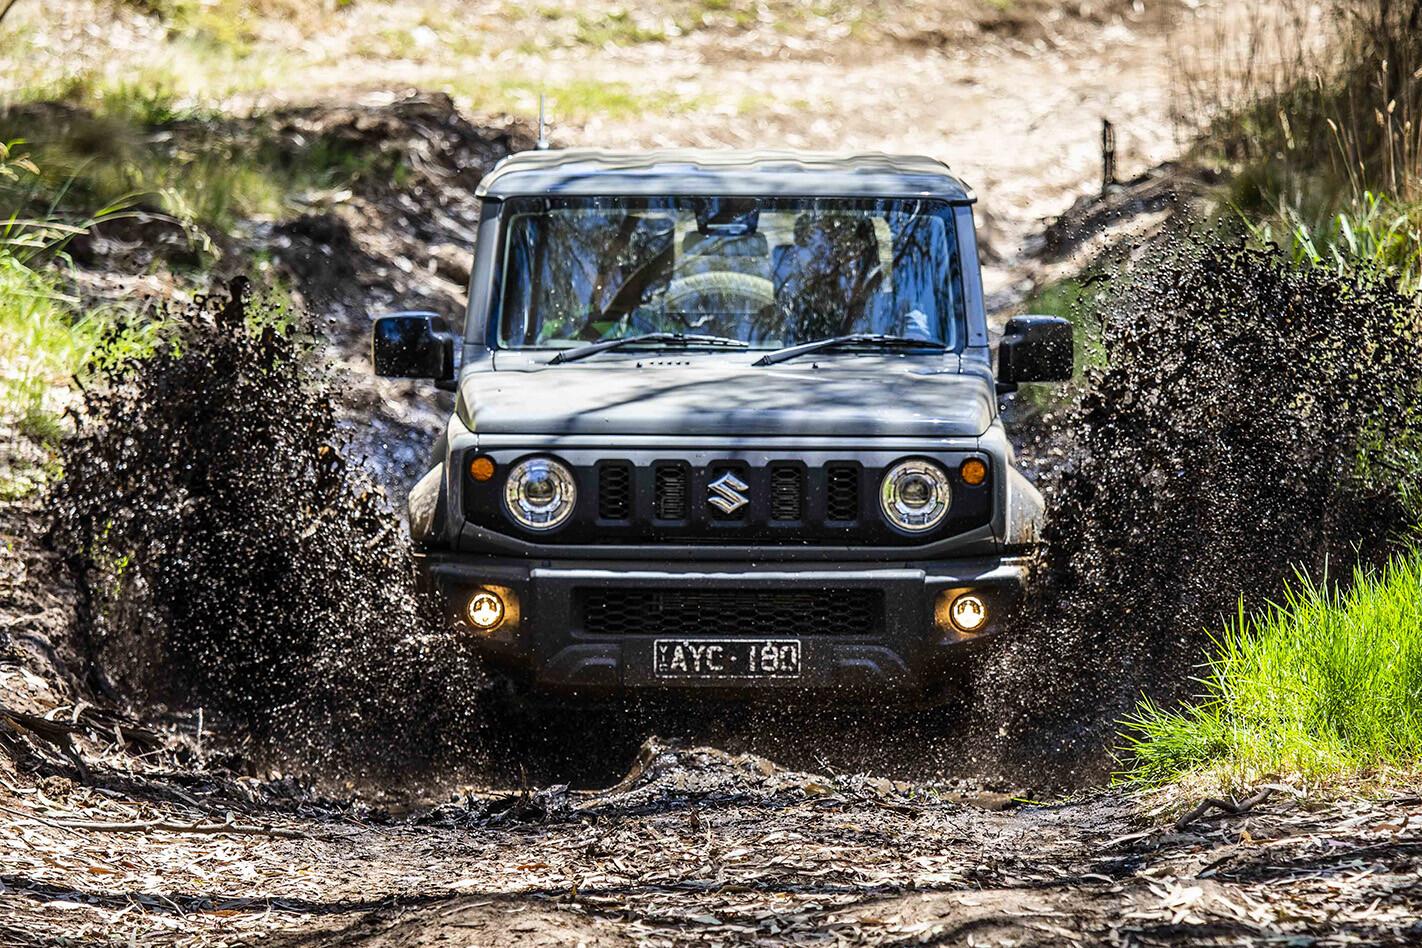 2019 Suzuki Jimny Offroad Front Mudsplash Jpg